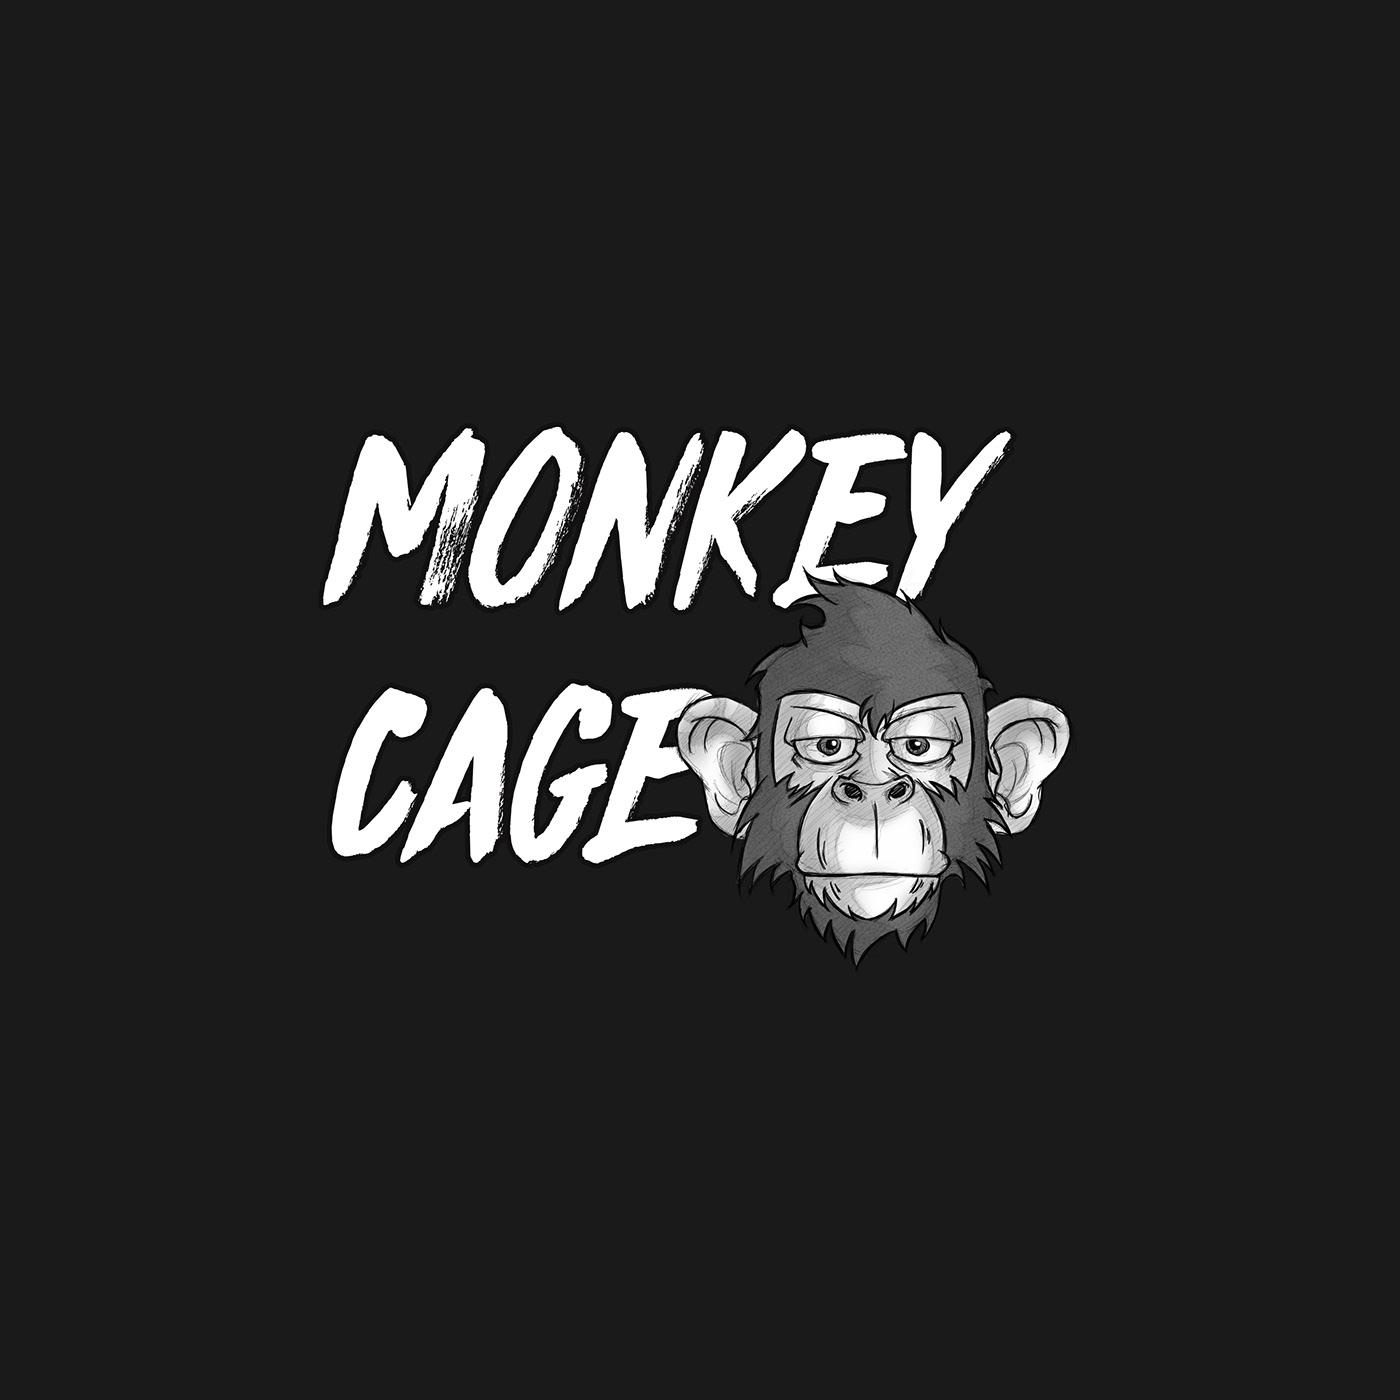 MONKEY CAGE // Thumbnail